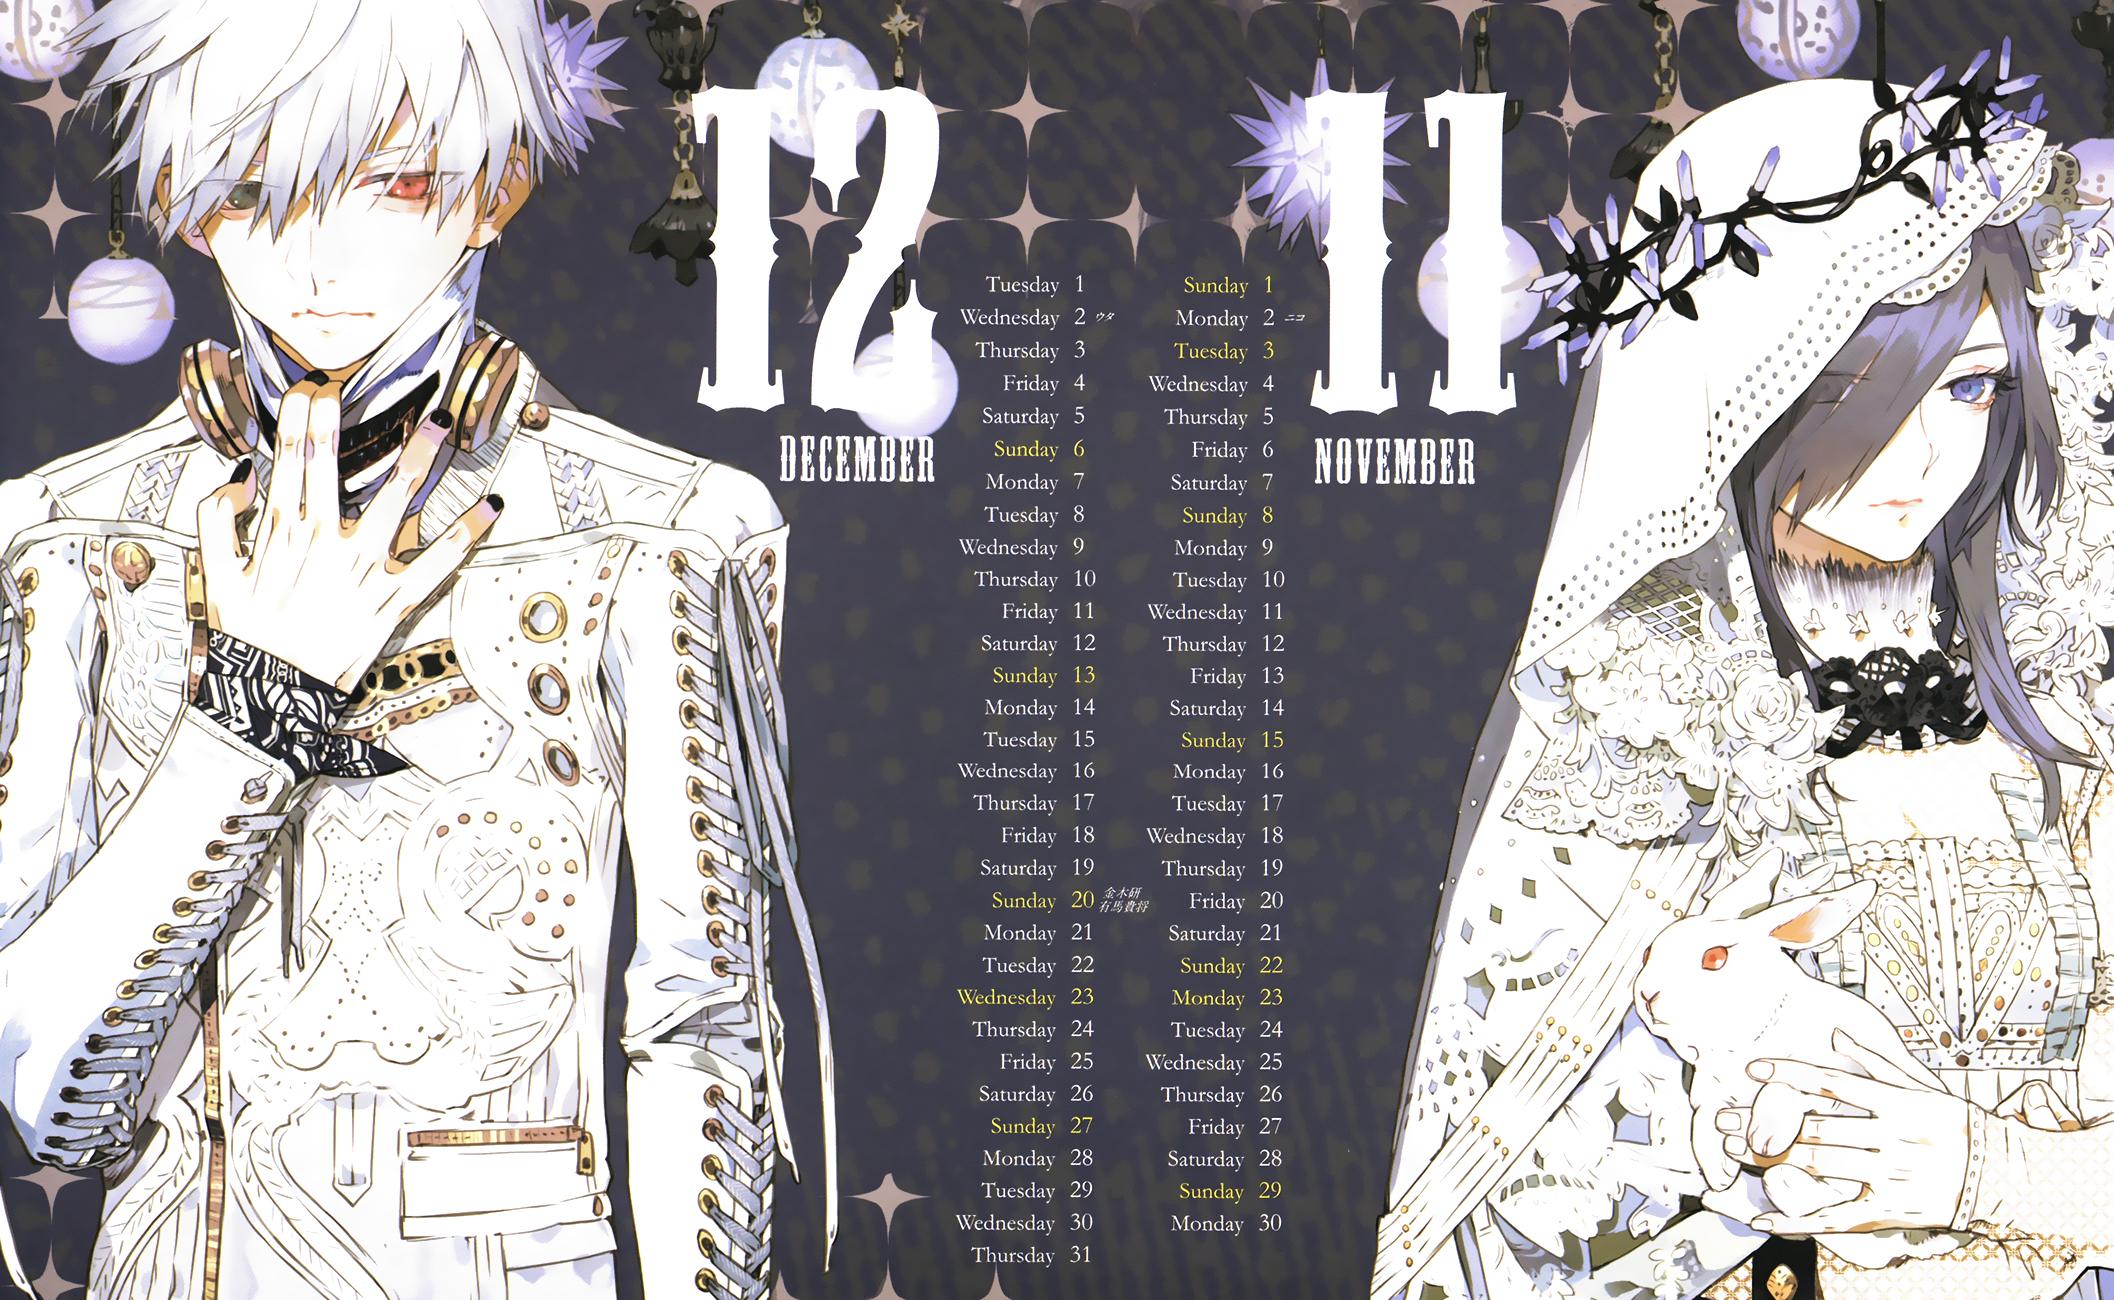 Tokyo Ghoul Calendar Art : Tokyo ghoul special illustration calendar